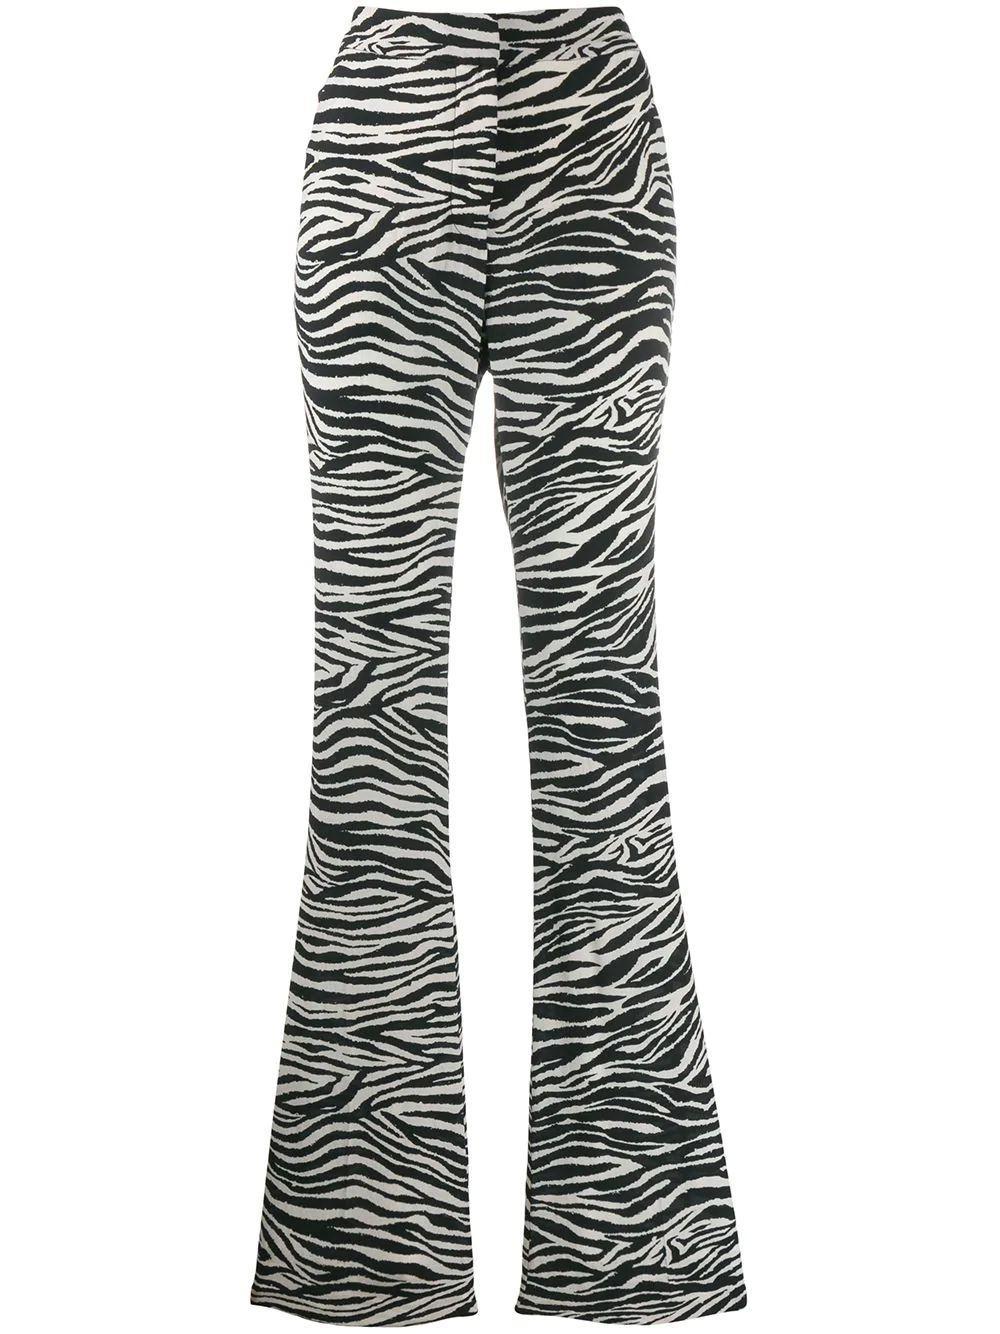 Odessa Slim Flare Trouser